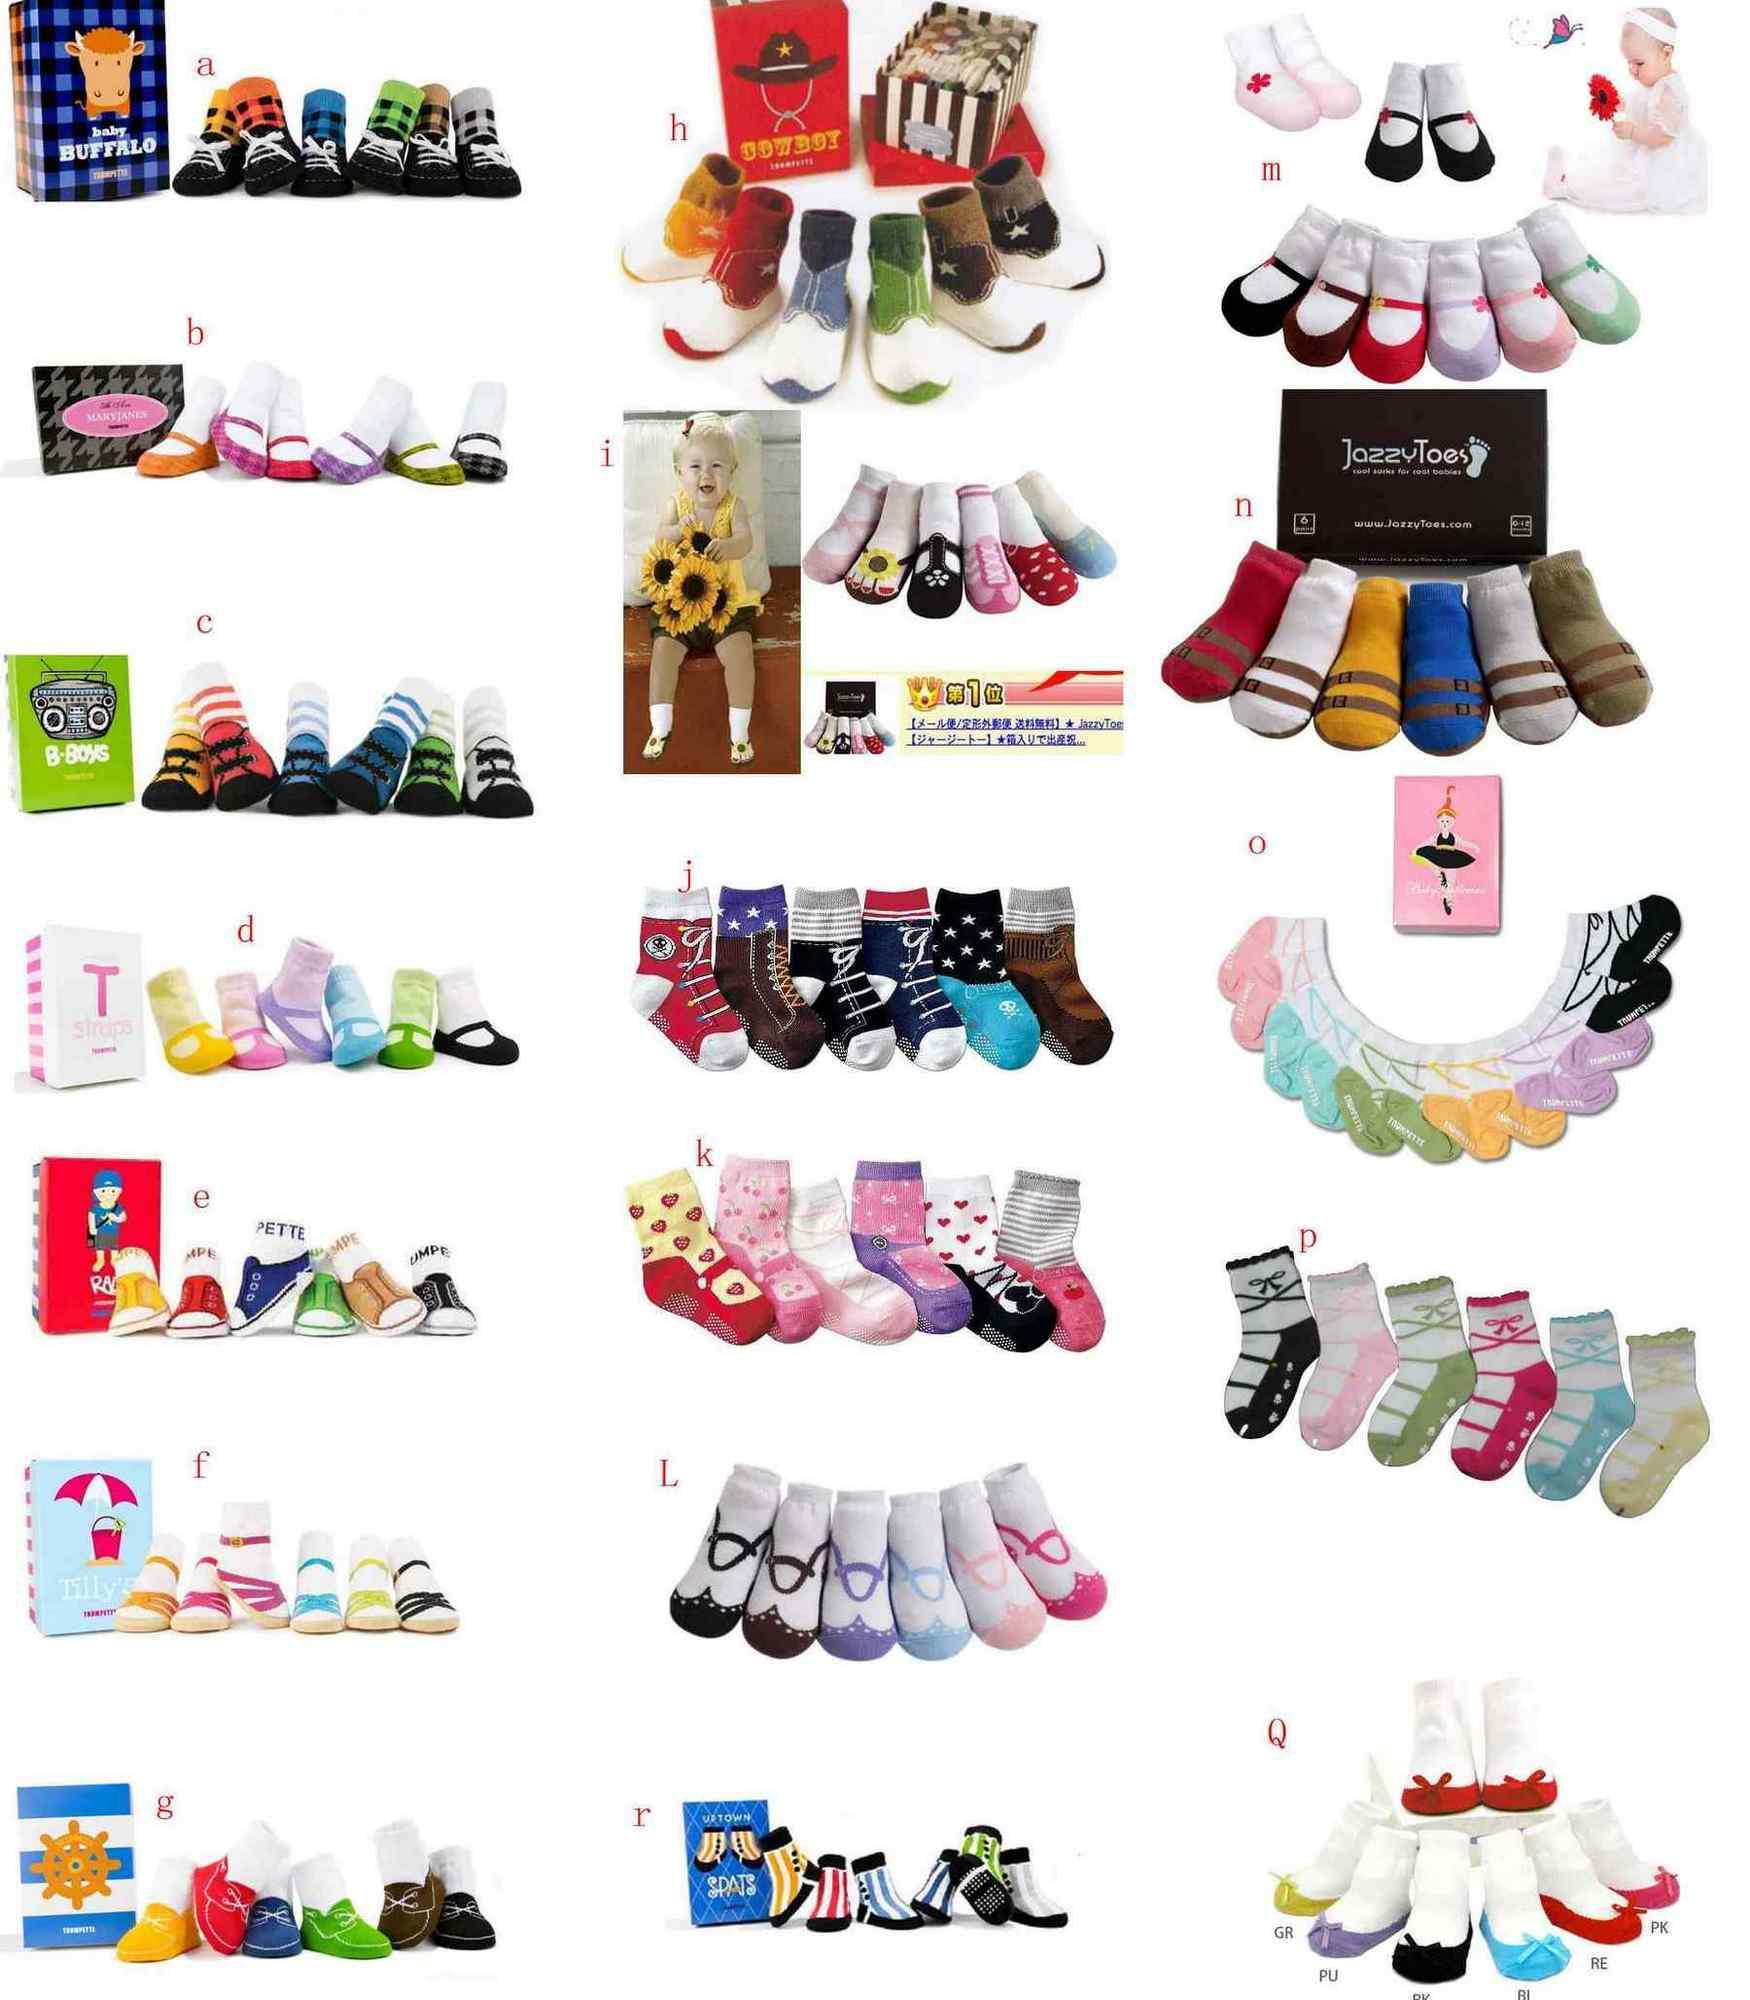 d1f68f7c3 Factory Supply Baby Shoe Socks Infant Toddler Sneakers Girl Shoe Socks  Trumpette Sweet Feet Assorted Black Sock Socks Buy Online From Melee